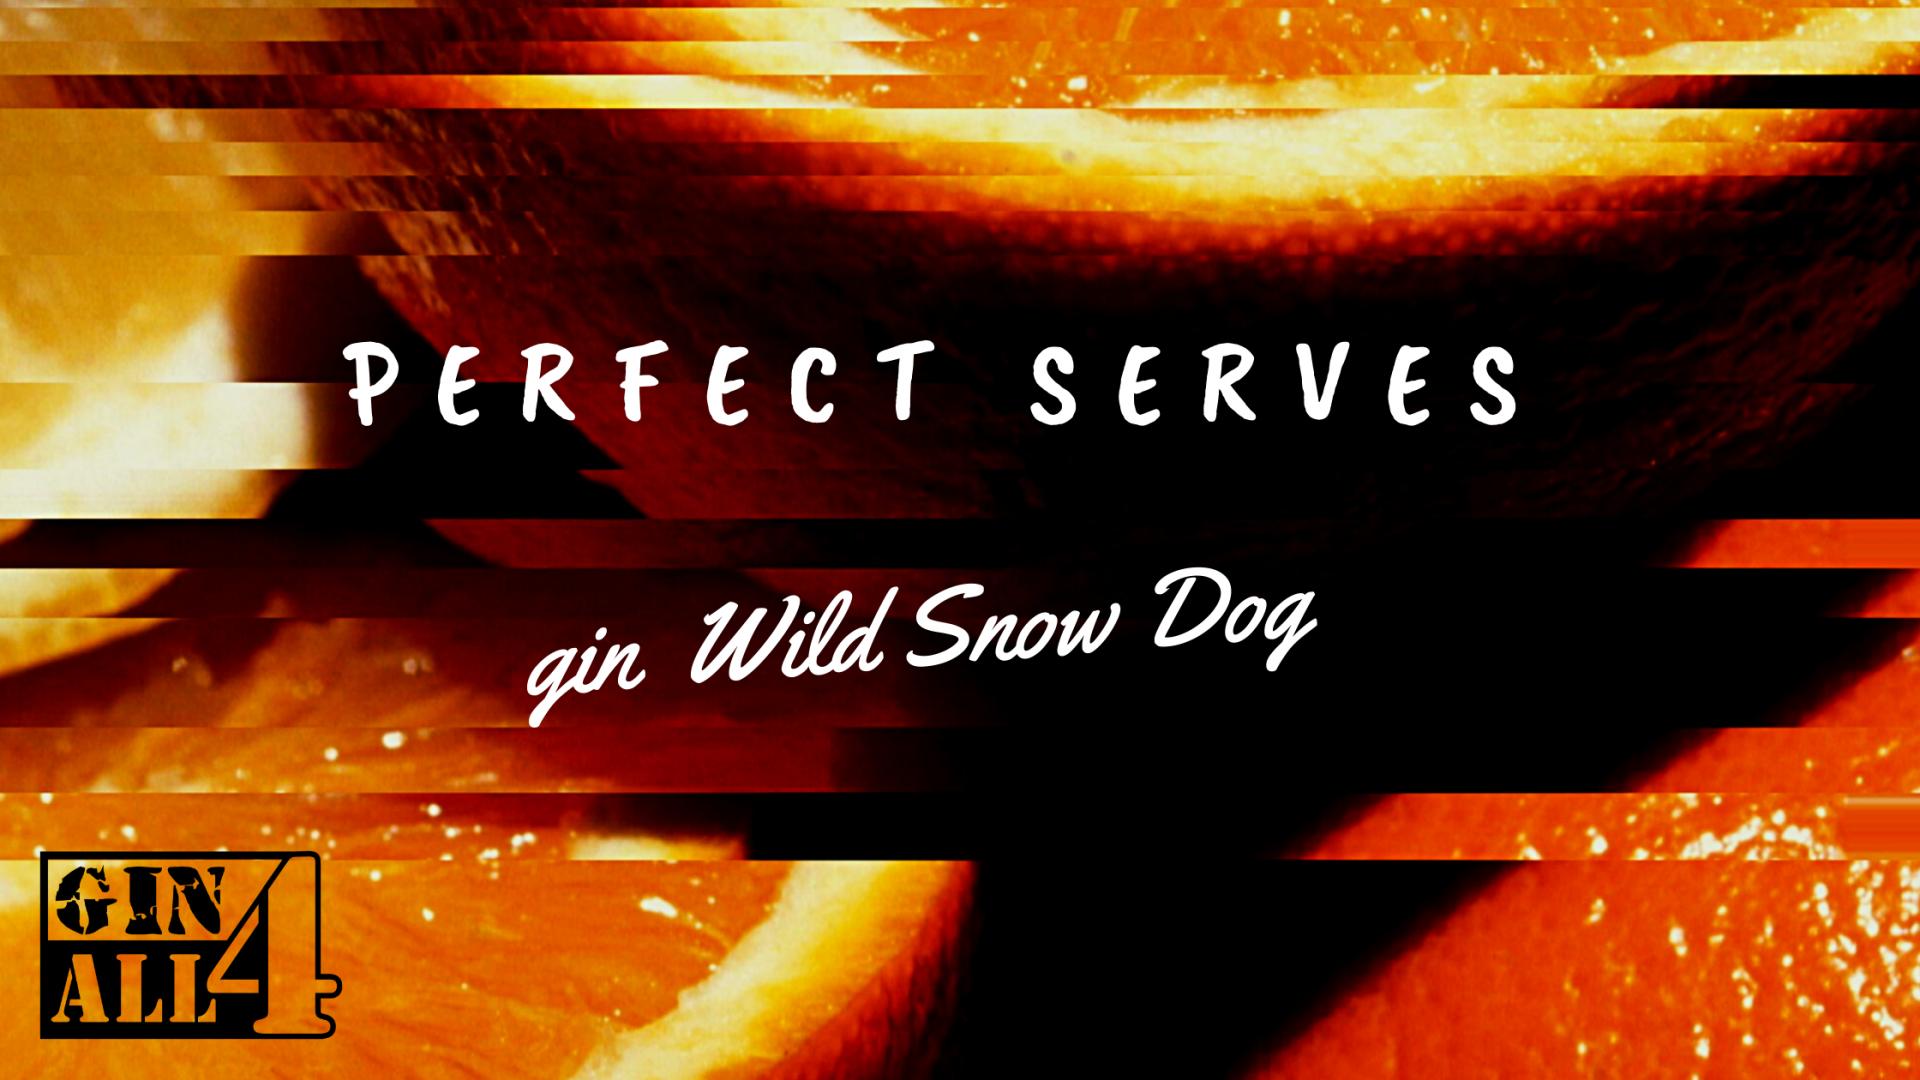 Perfect Serves - GIN WILD SNOW DOG